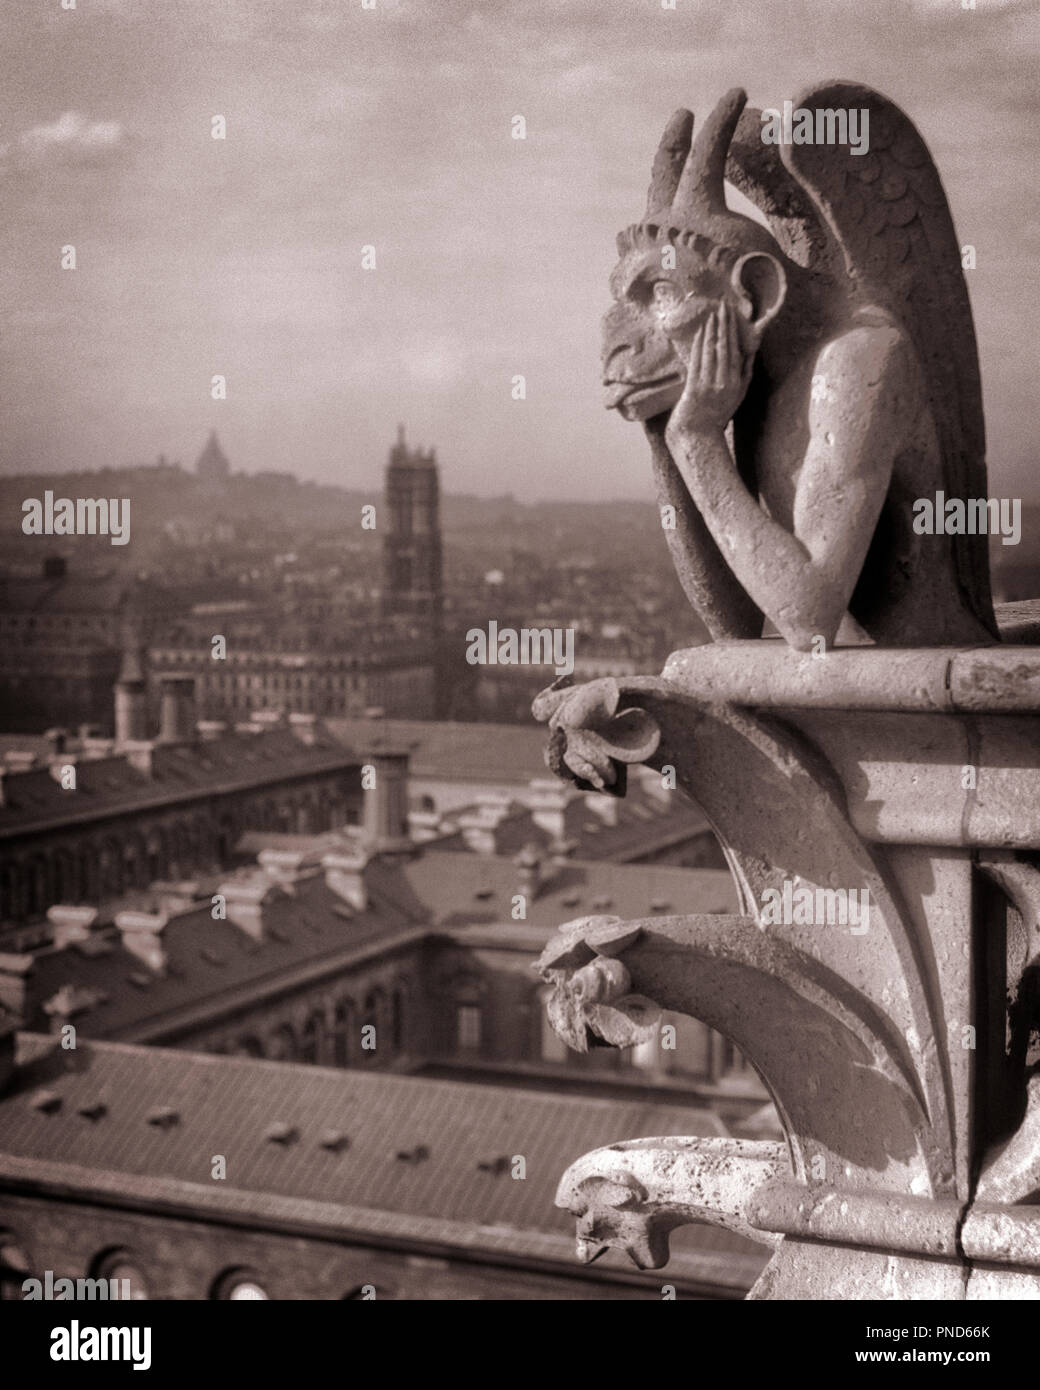 Fantasia Storica Immagini E Fotos Stock Alamy